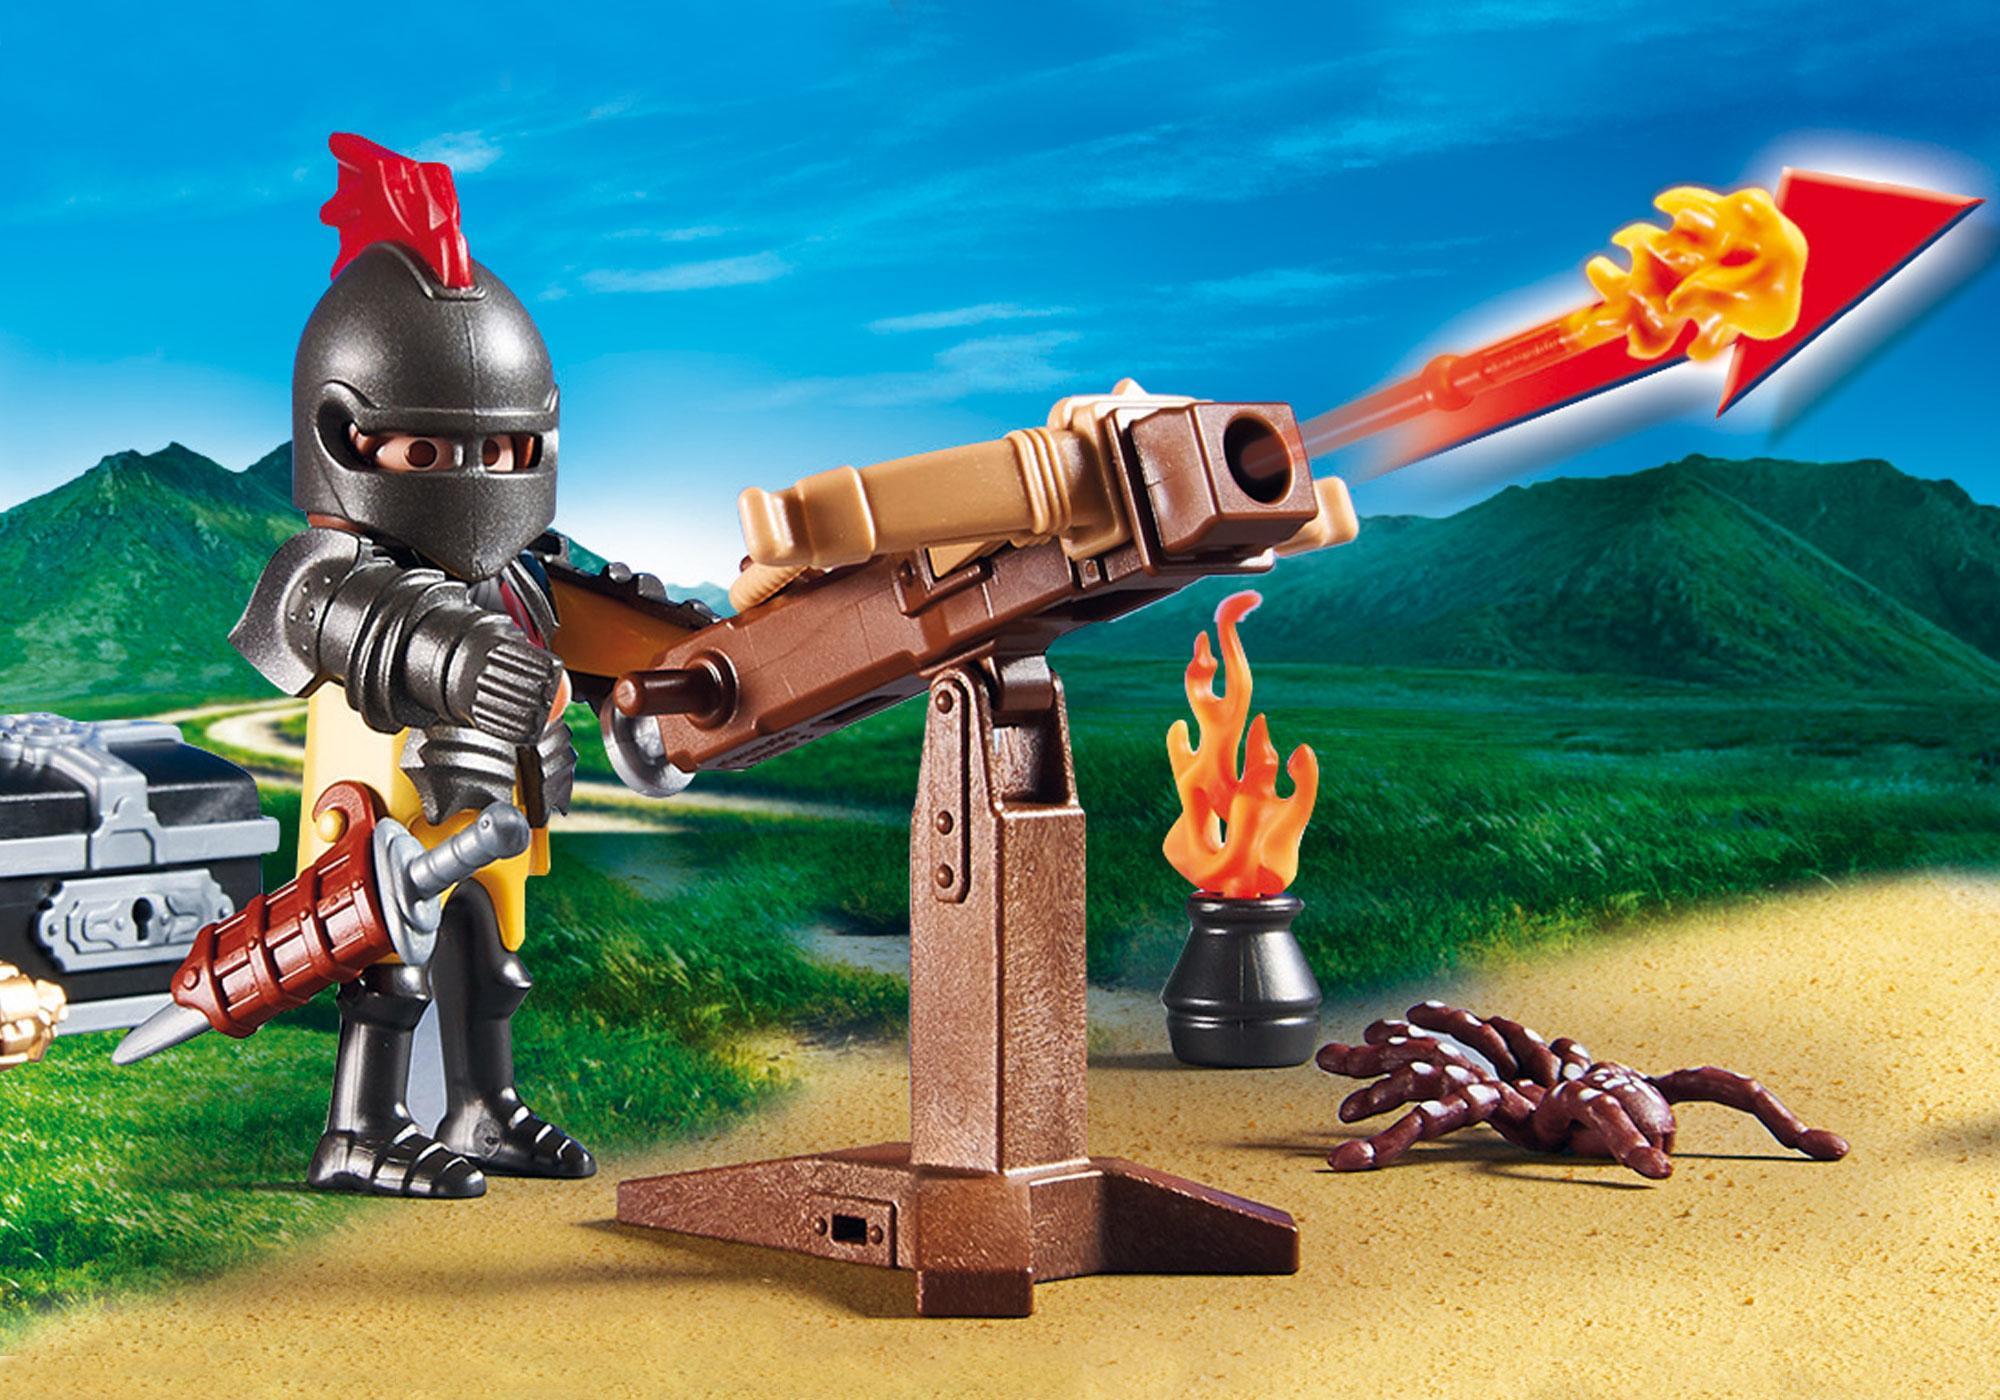 http://media.playmobil.com/i/playmobil/70036_product_extra1/StarterPack Knight's Treasure Battle